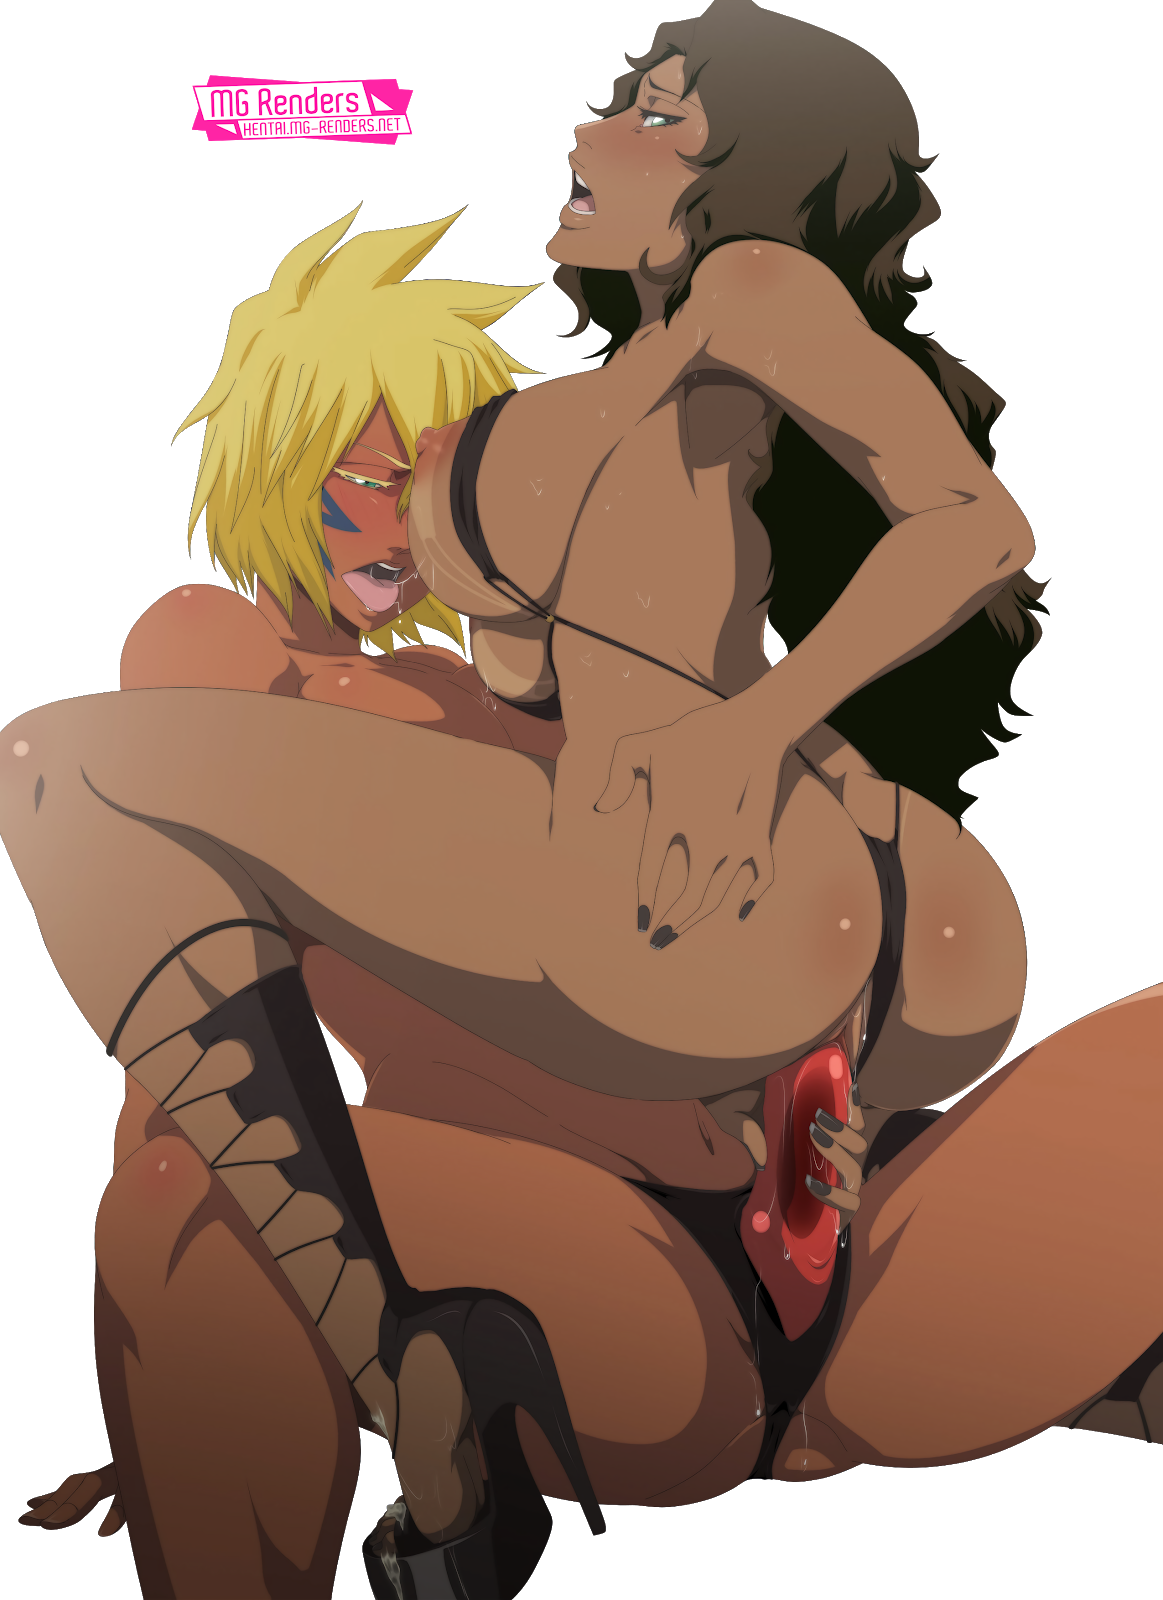 Tags: Anime, Render,  Ass Grab,  BLEACH,  Dark skin,  Dildo,  Franceska Mila Rose,  High heels,  Huge Breasts,  Micro Bikini,  Nipples,  No bra,  Spread Legs,  Tier Harribel,  Vagina,  Vaginal object insertion,  Vaginal Sex,  Yuri, PNG, Image, Picture